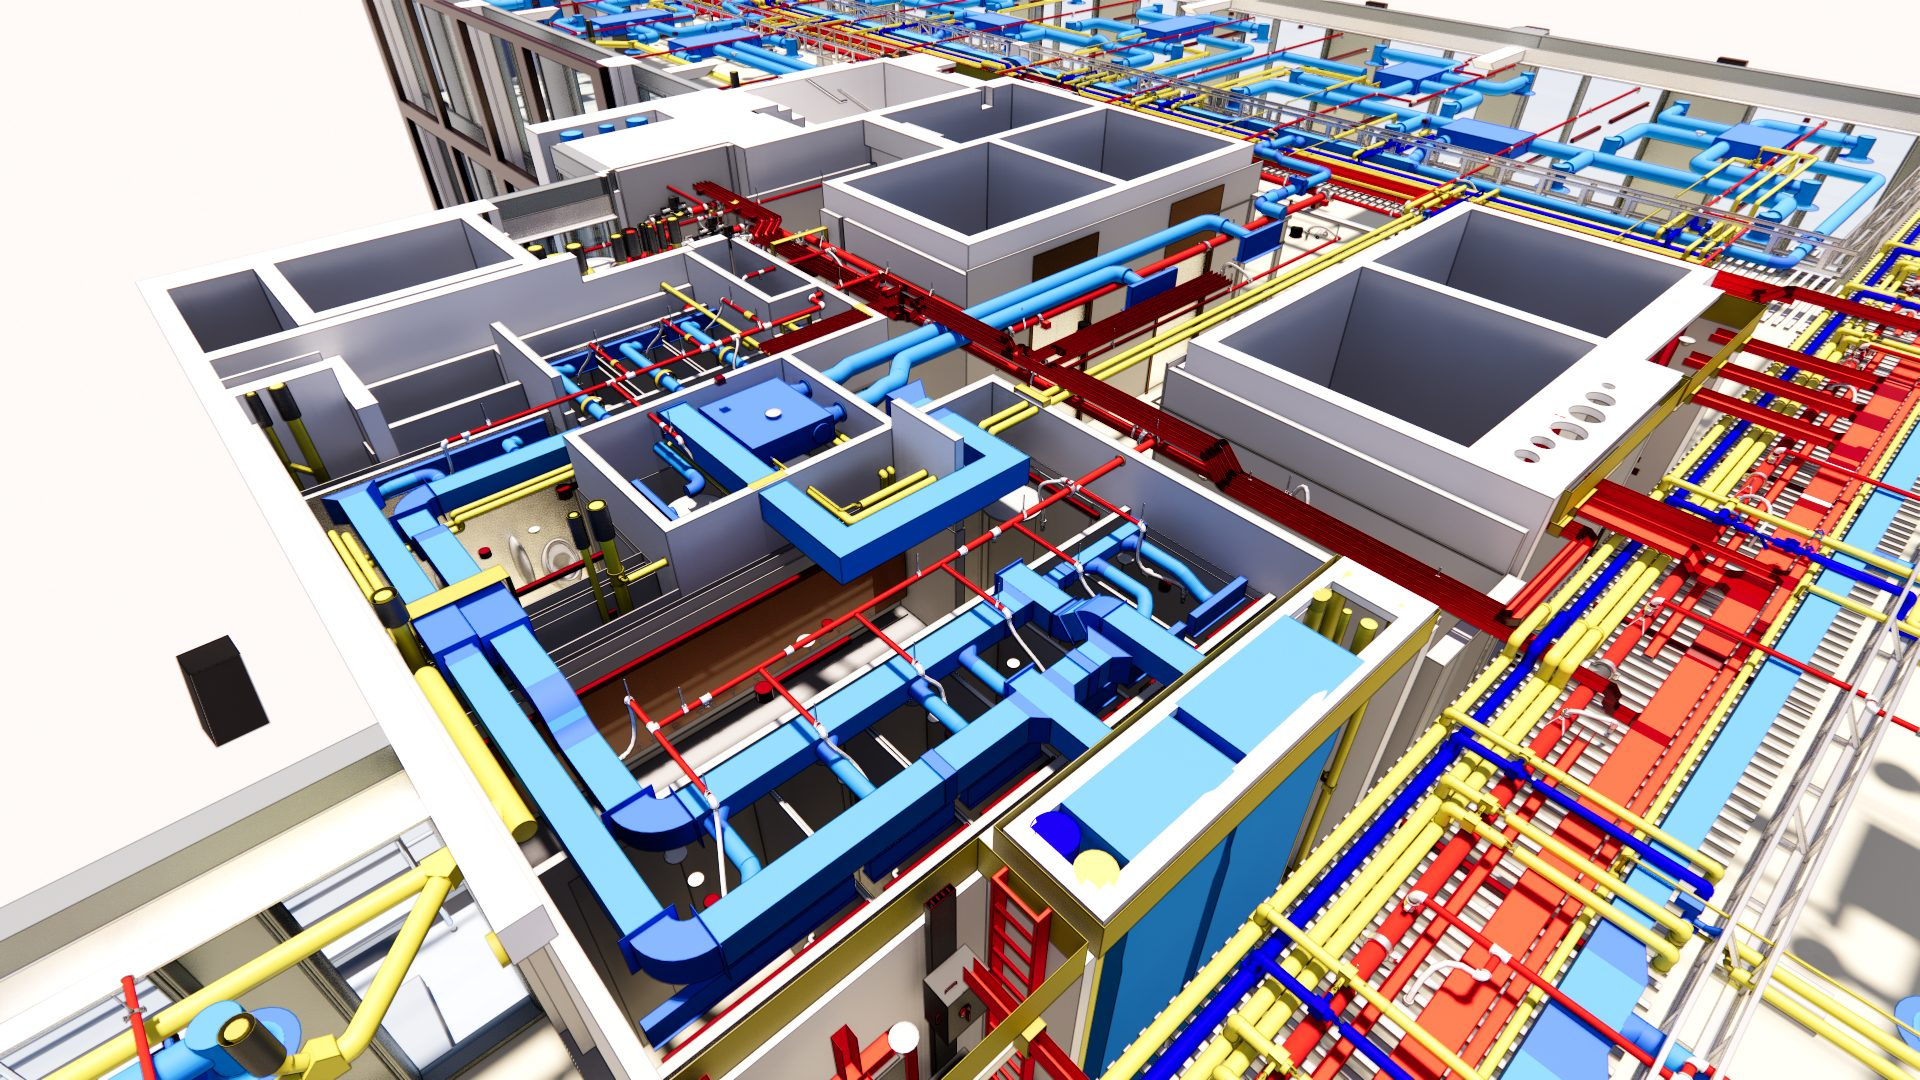 Utilities in a building